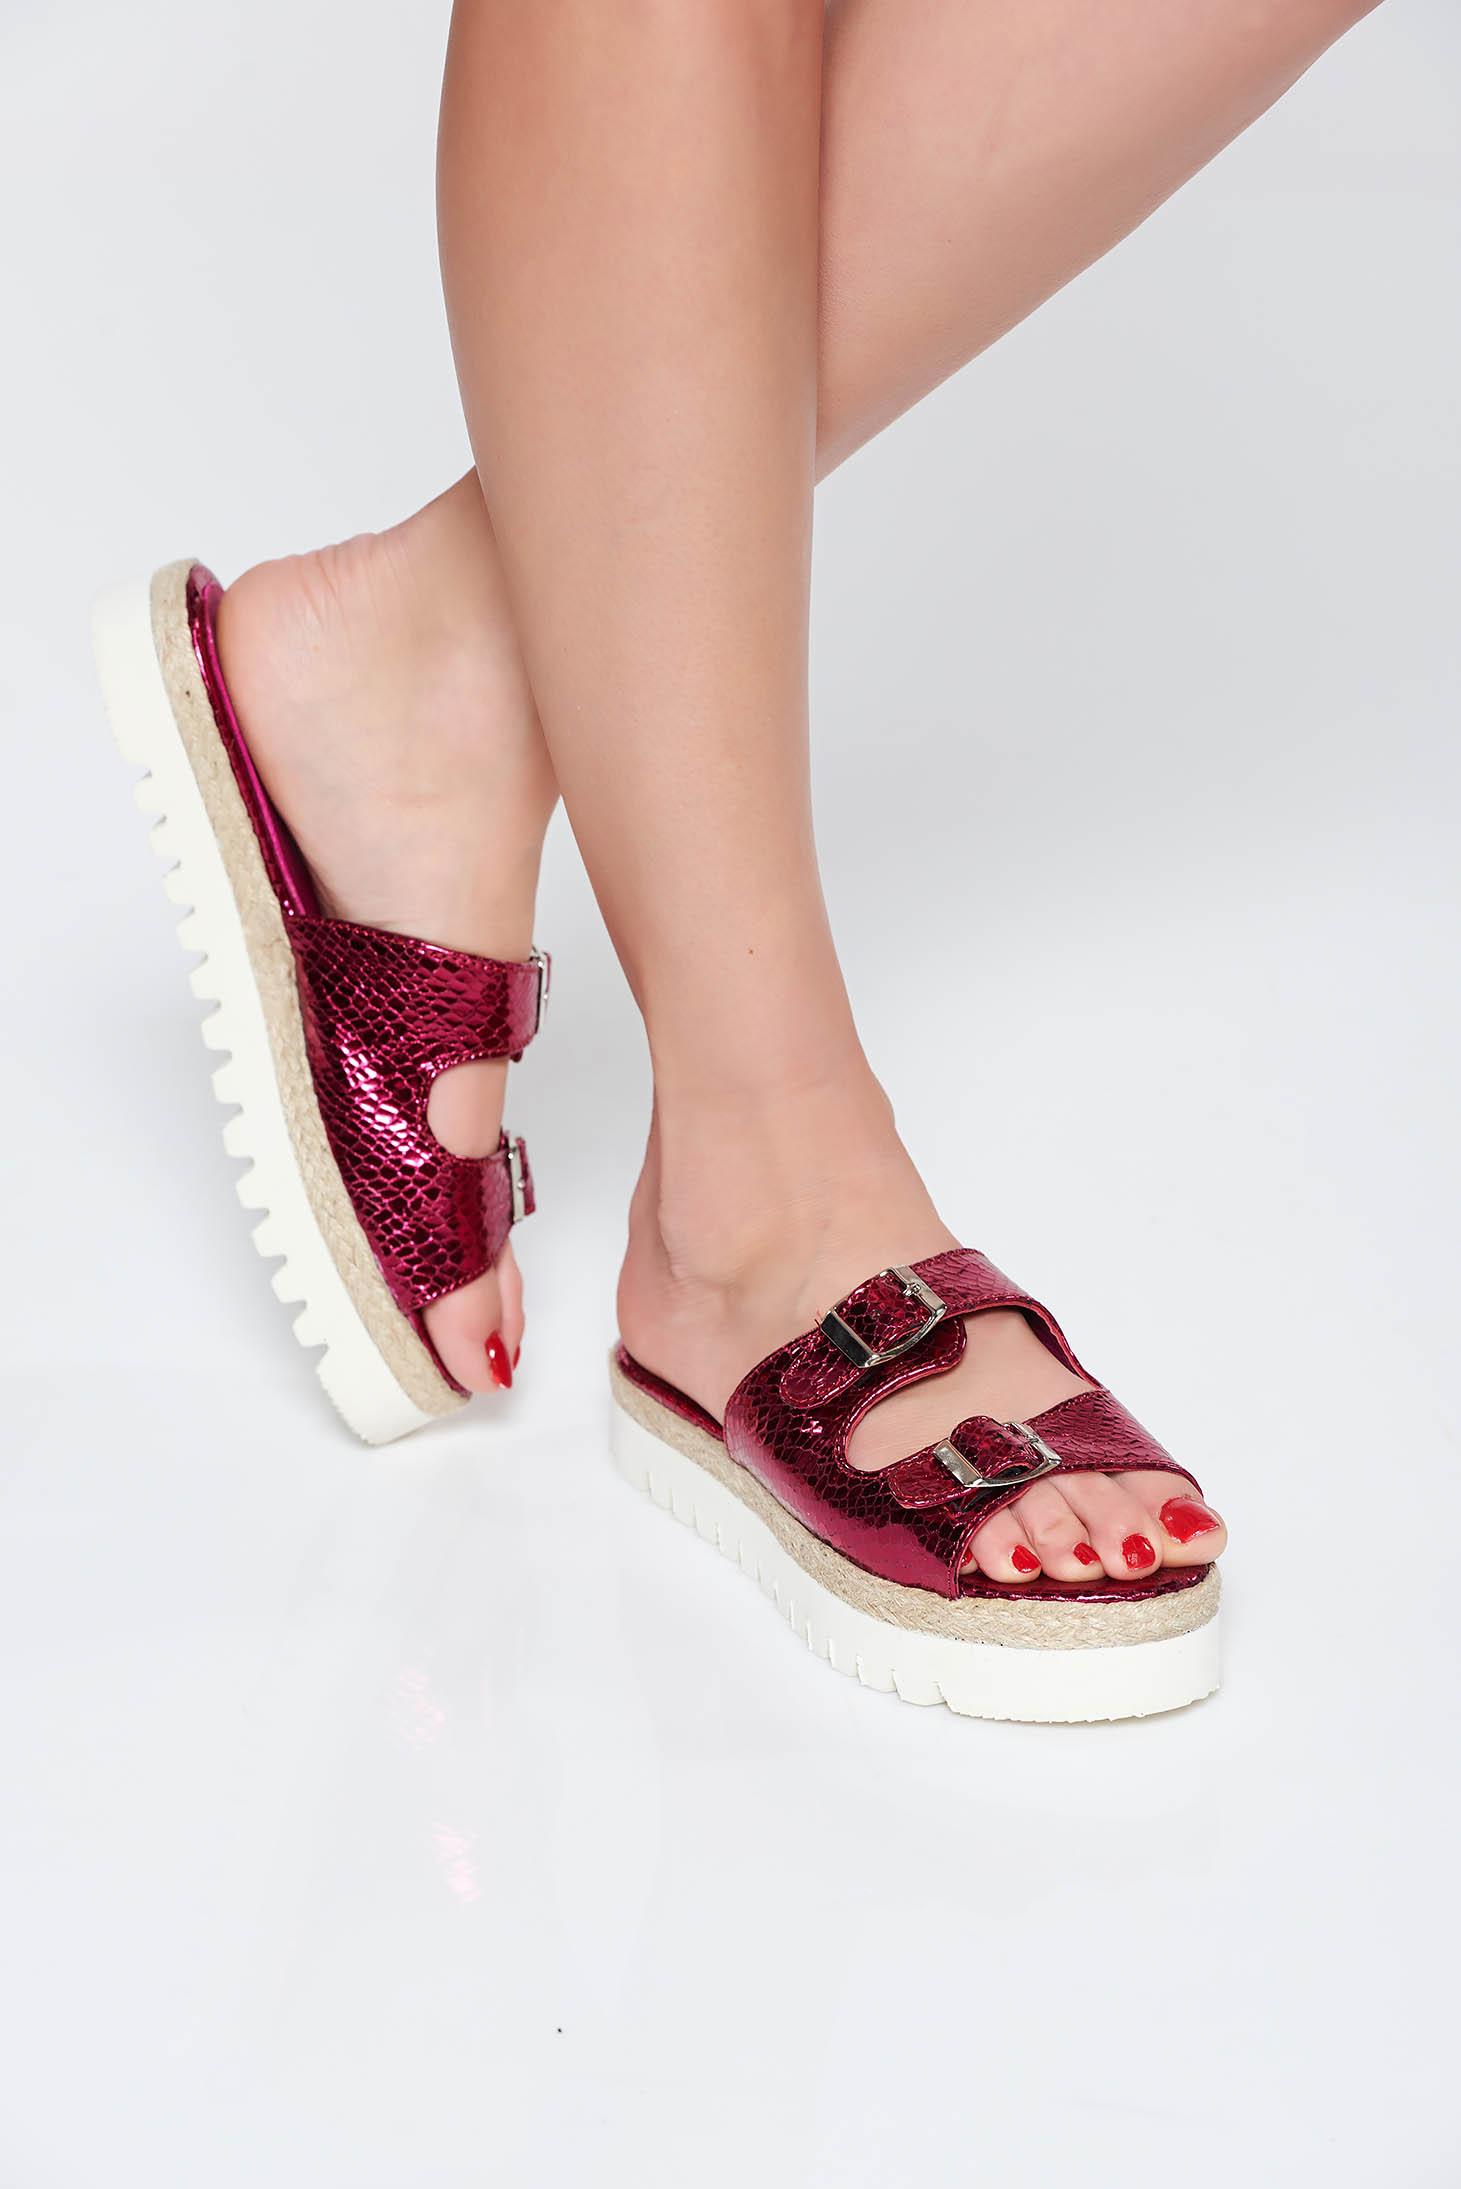 Papuci StarShinerS roz casual din piele naturala cu talpa joasa accesorizati cu catarame